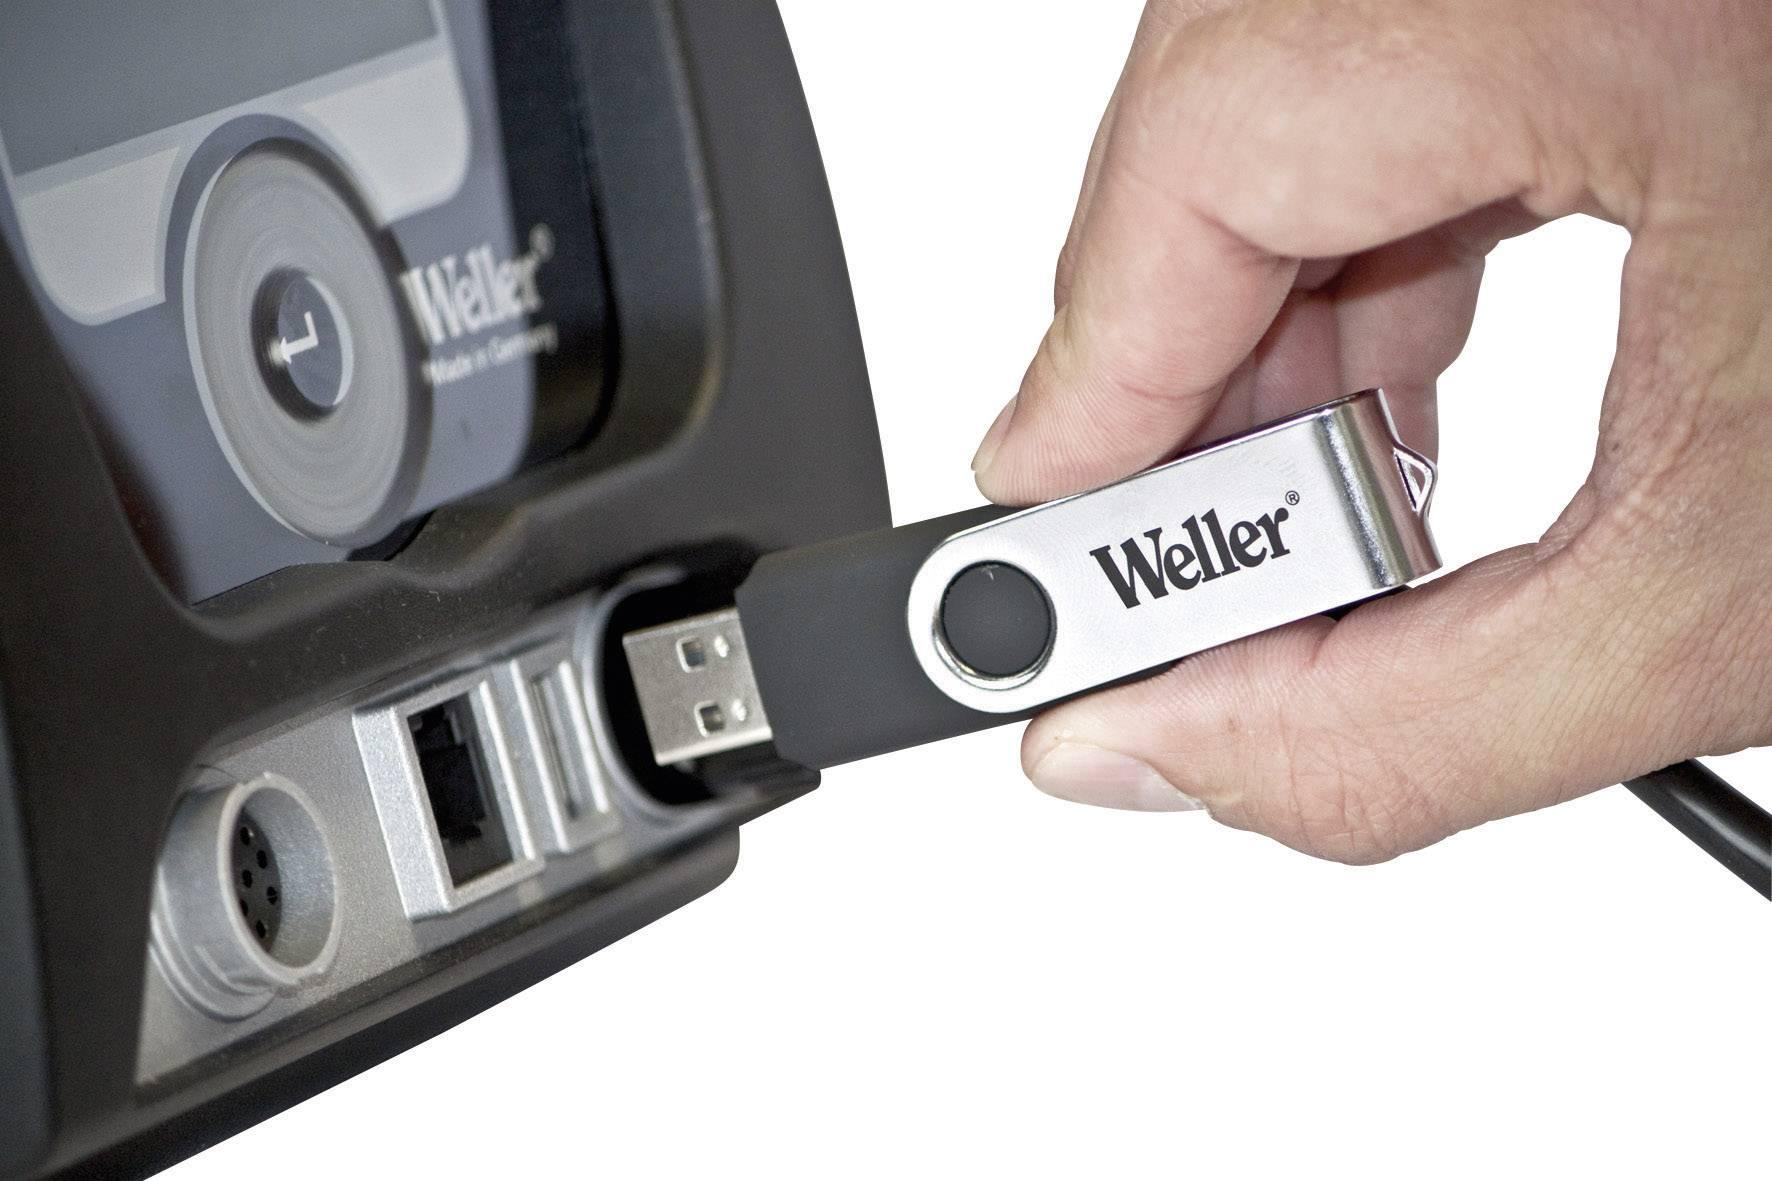 Spájkovacia stanica Weller WX 2021 T0053422699, 230 V/50 Hz